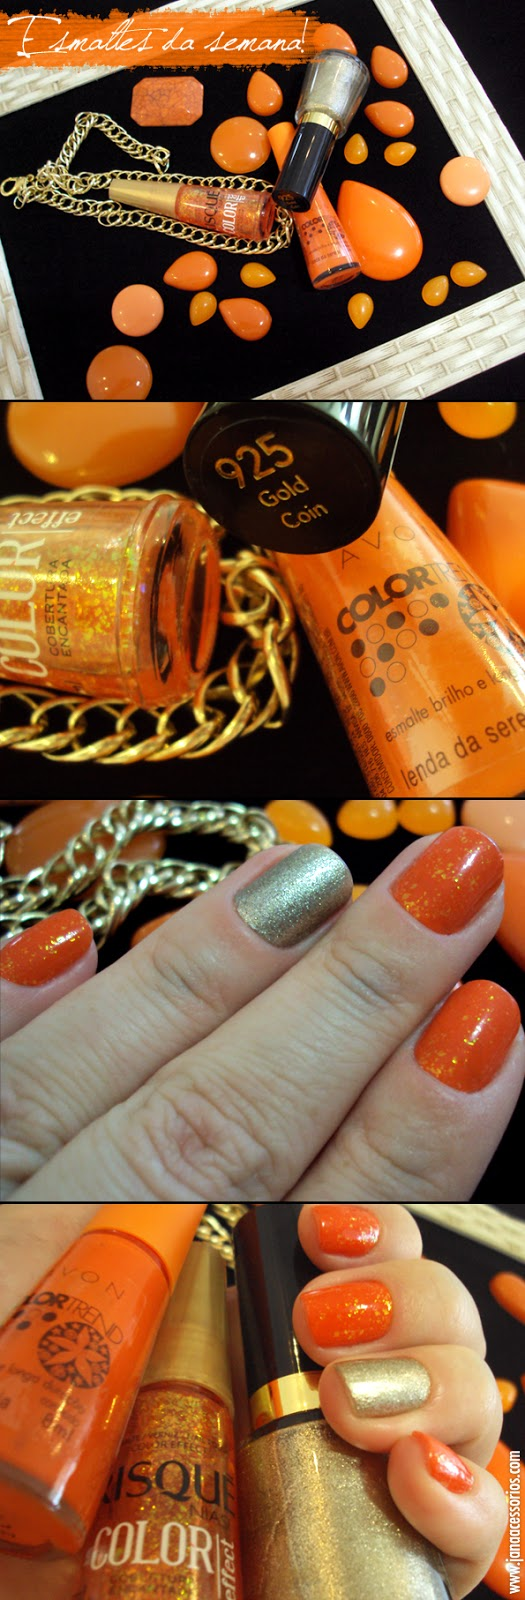 esmalte da semana, nails, laranja